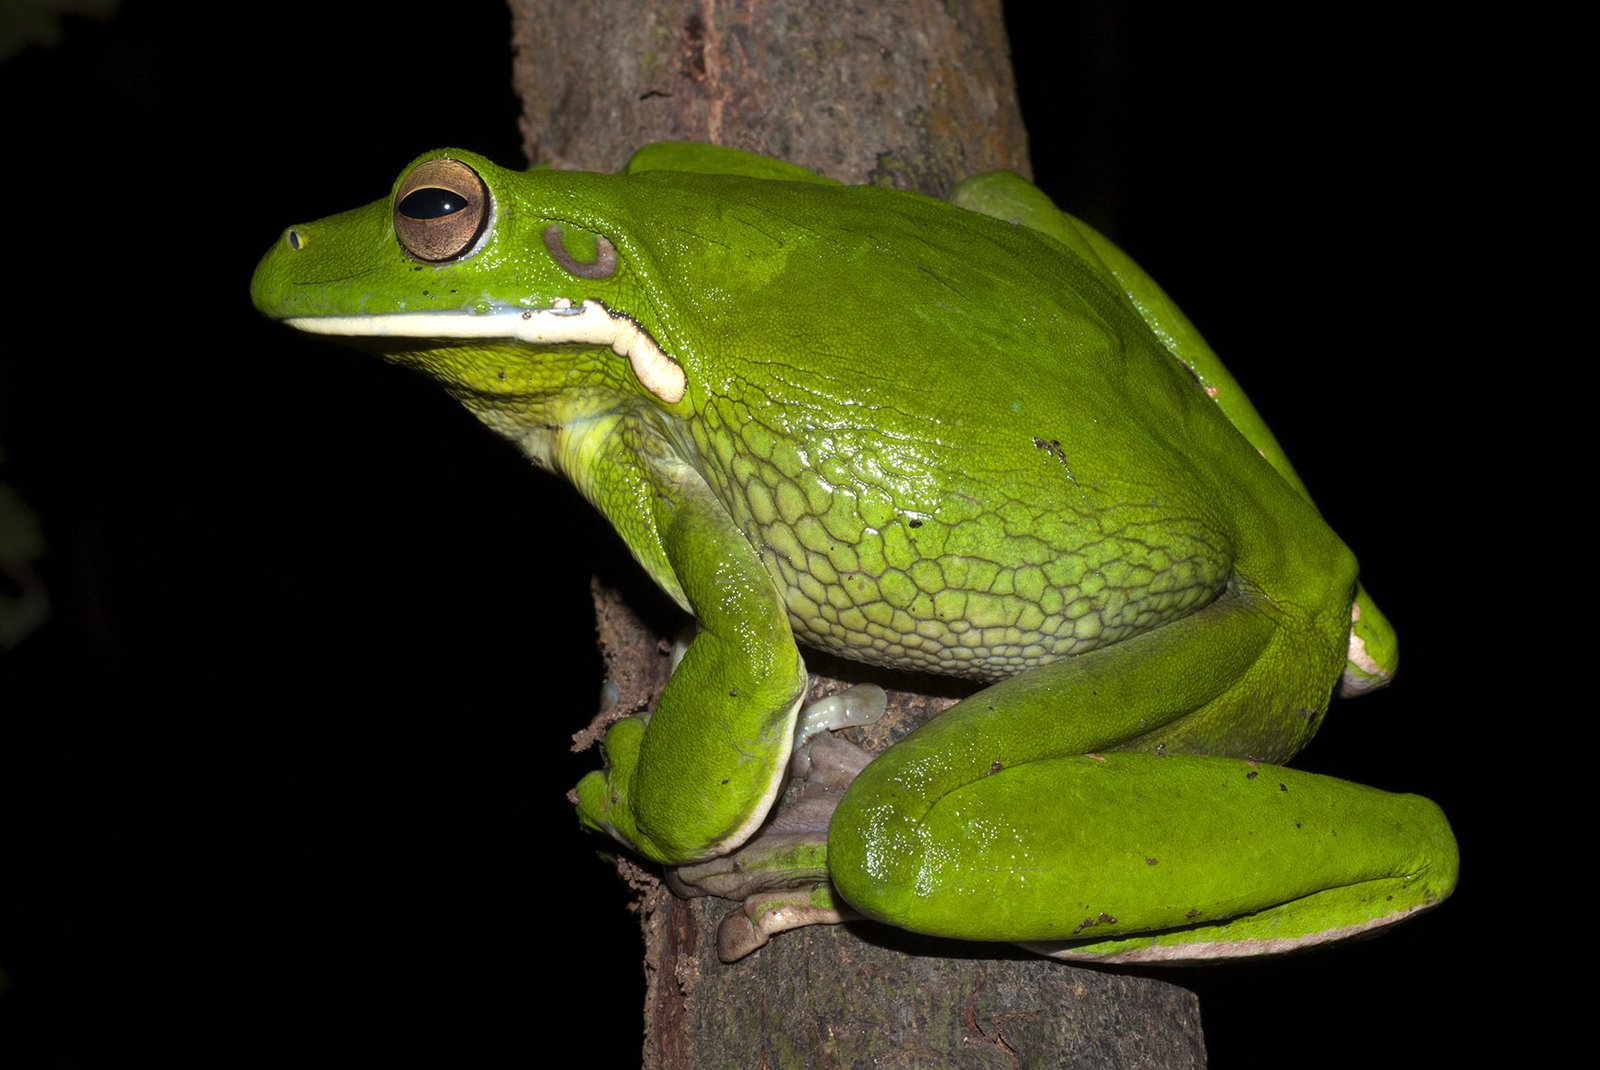 White-lipped Tree Frog (Litoria infrafrenata). [Photographer: Jodi Rowley. Copyright: Jodi Rowley]